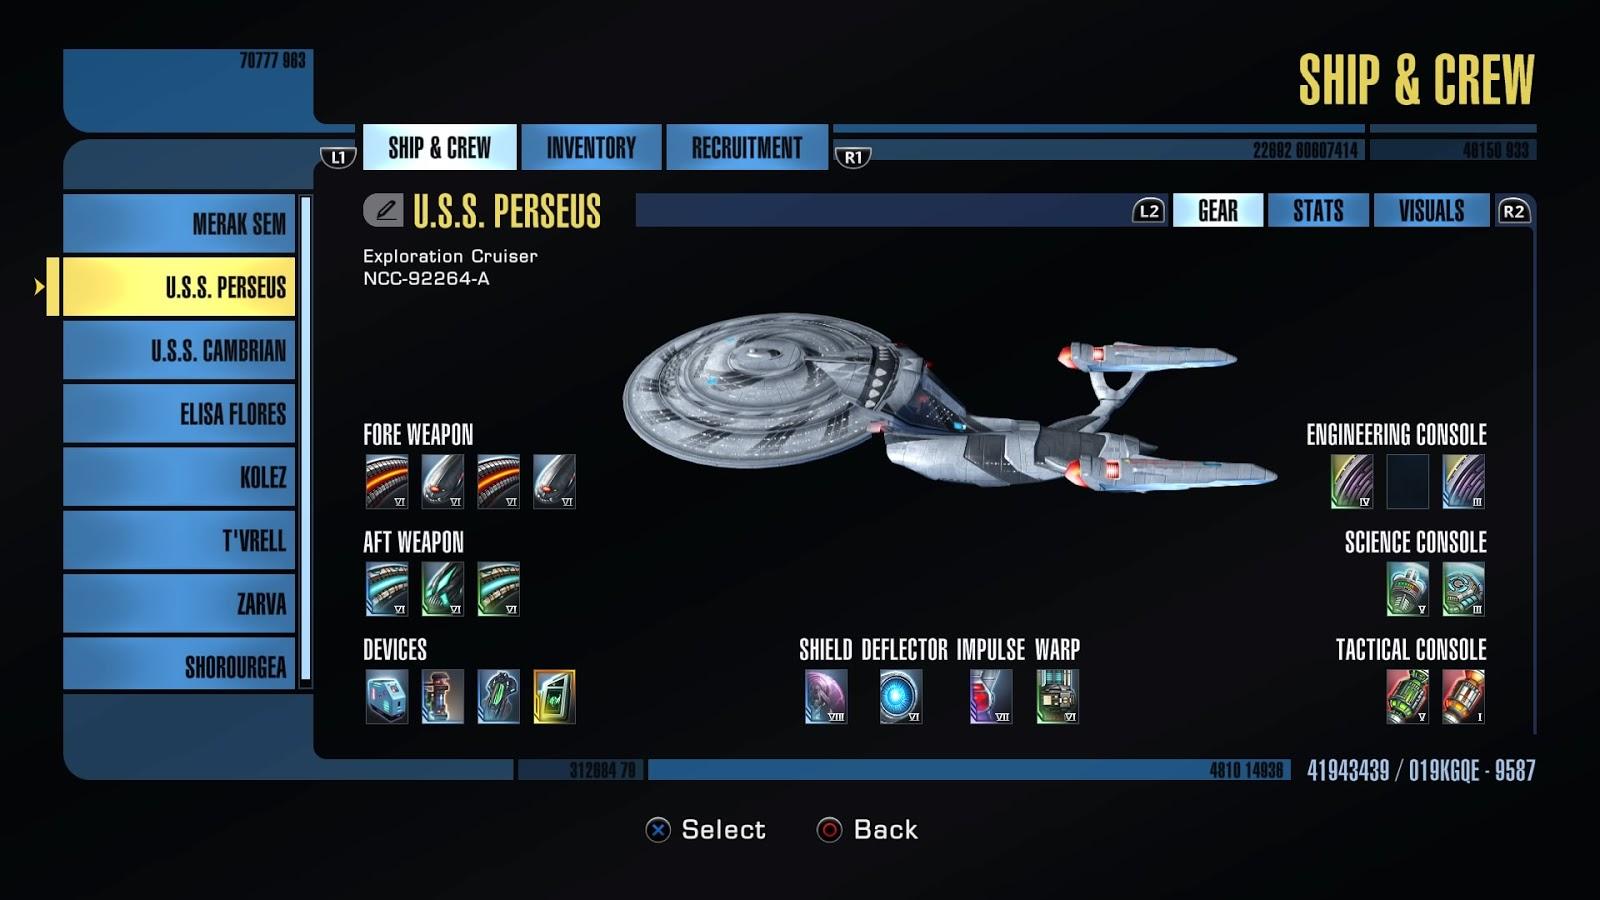 Mundos Hipotéticos: [Videojuegos] Star Trek Online: Potencial ...